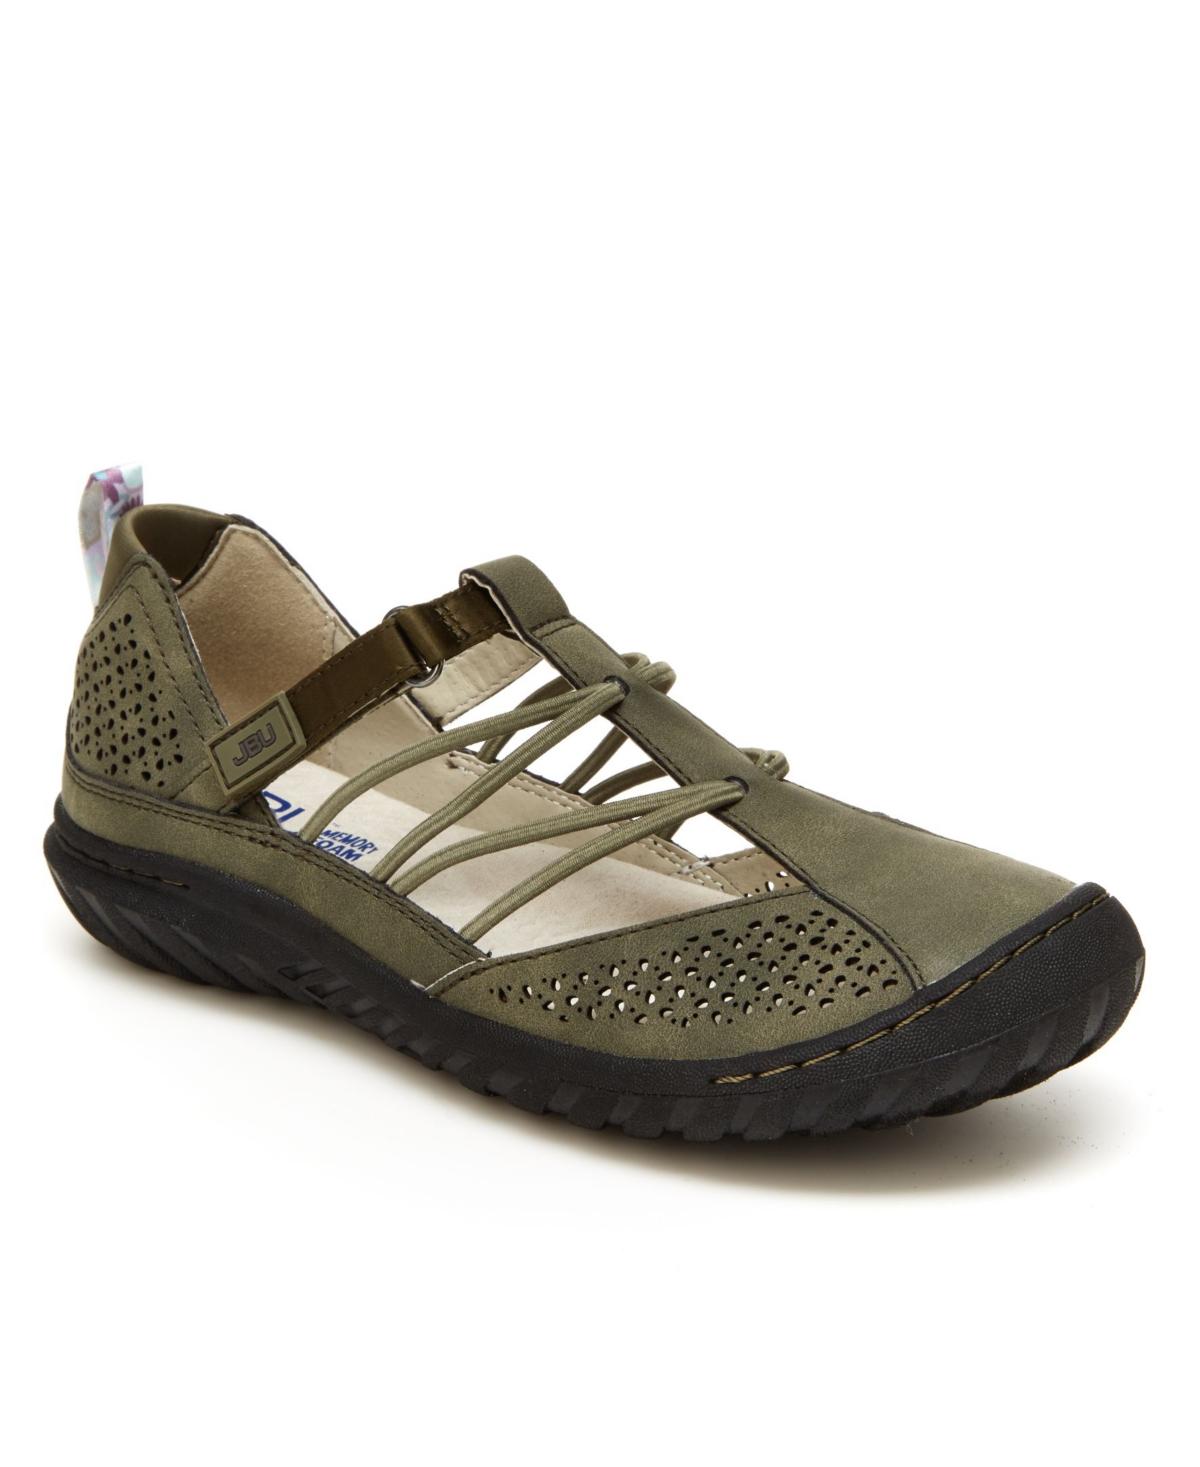 Women's Fig Casual Shoes Women's Shoes